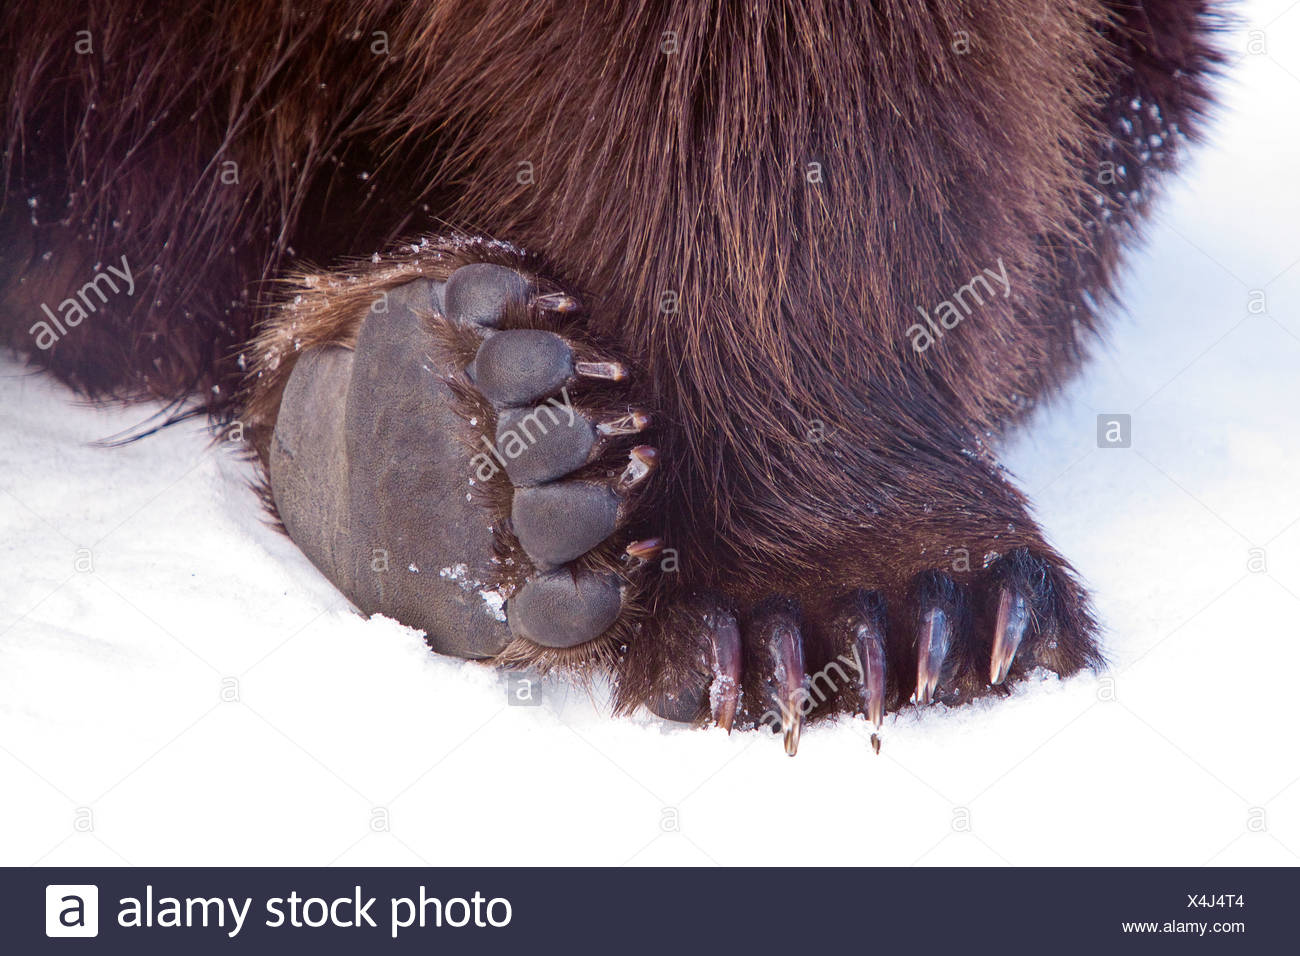 Pieds & Pads de grizzli à AWCC, Alaska Wildlife Conservation Center Photo Stock